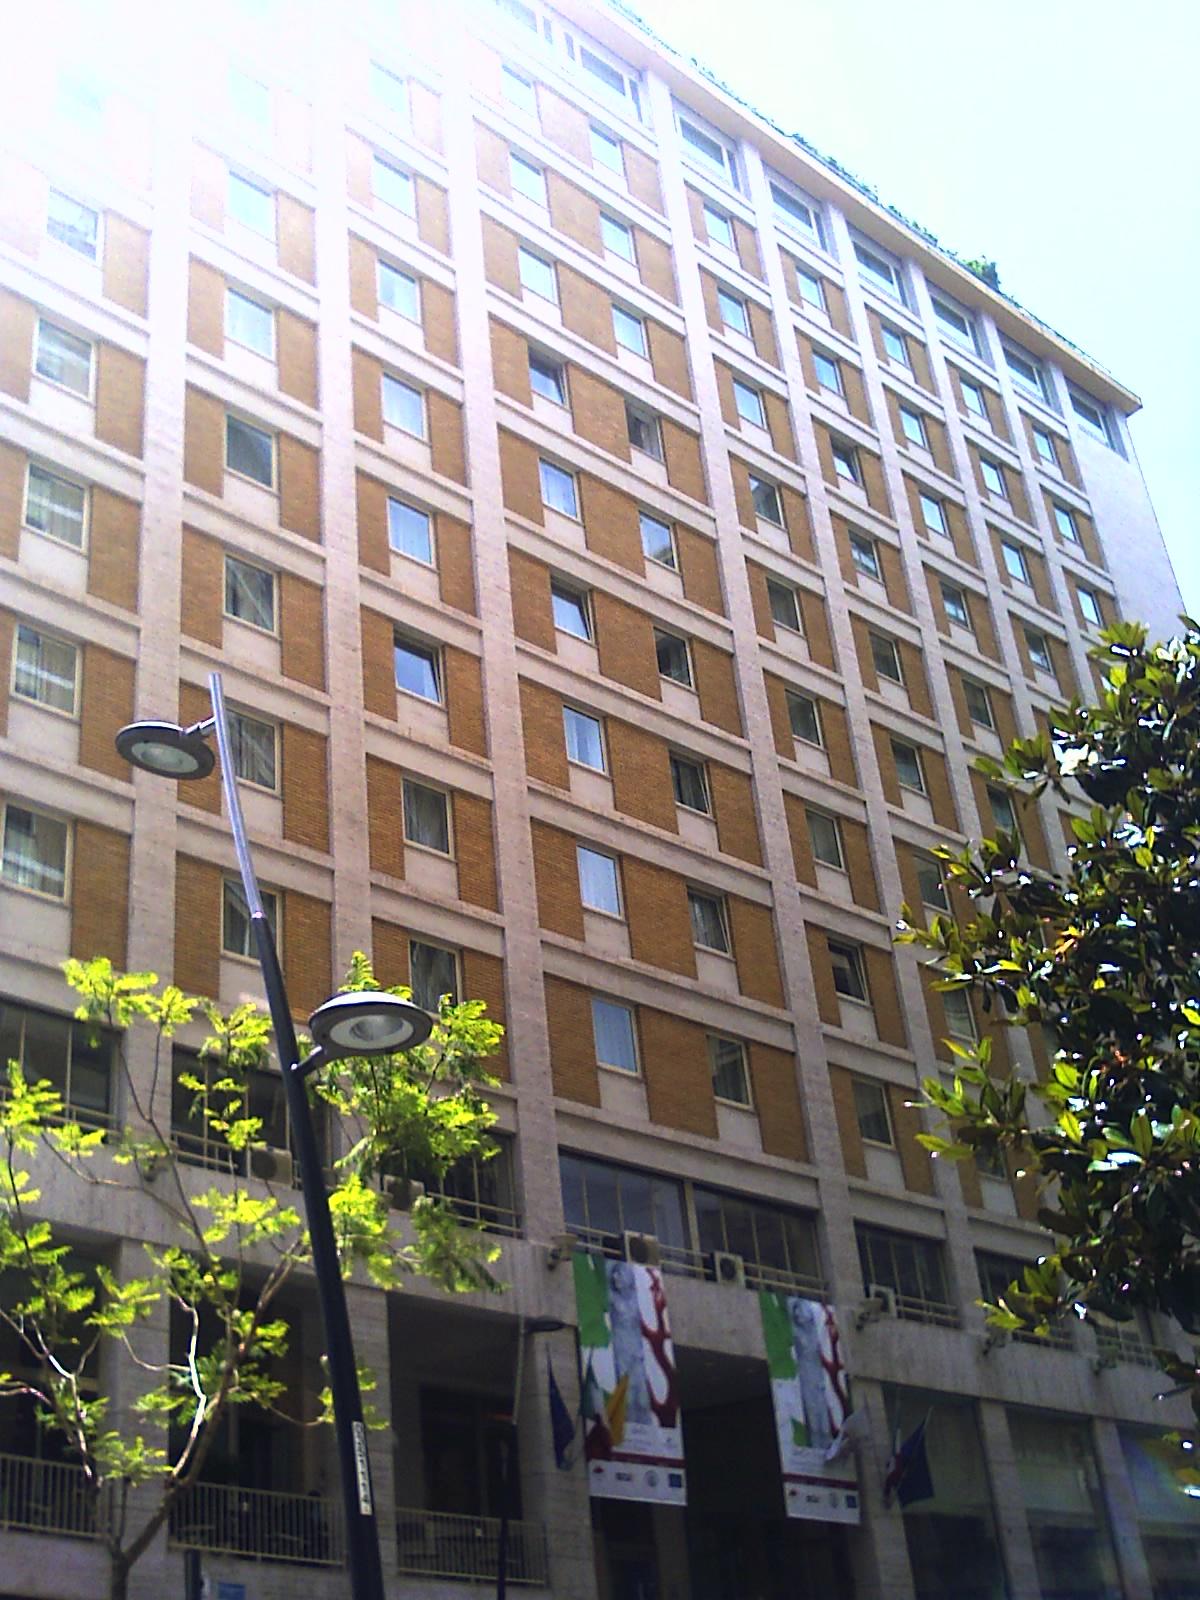 palazzo del renaissance hotel mediterraneo wikipedia